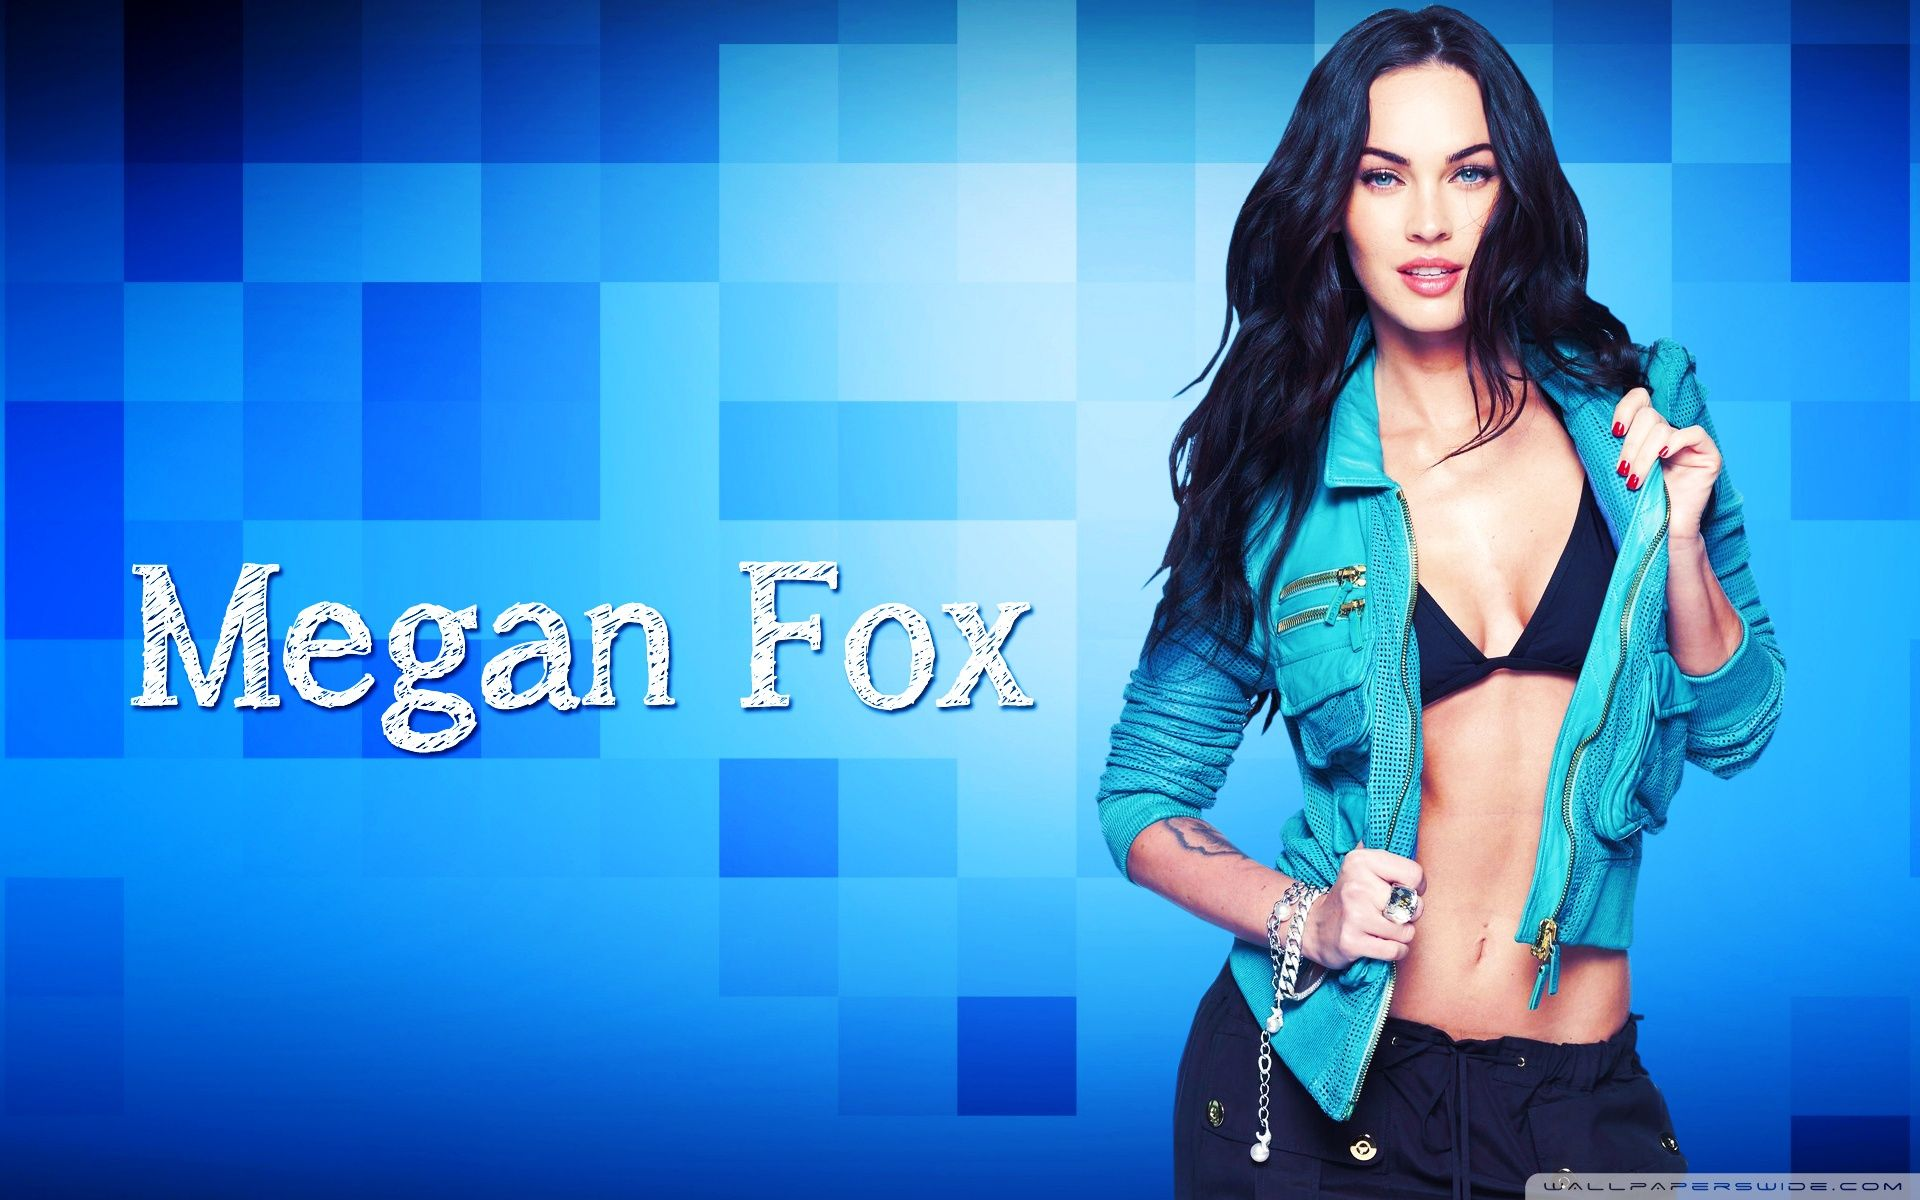 Megan Fox Wallpaper Hd Fantasy: Sexy Wallpaper Megan Fox Wallpapers For Free Download